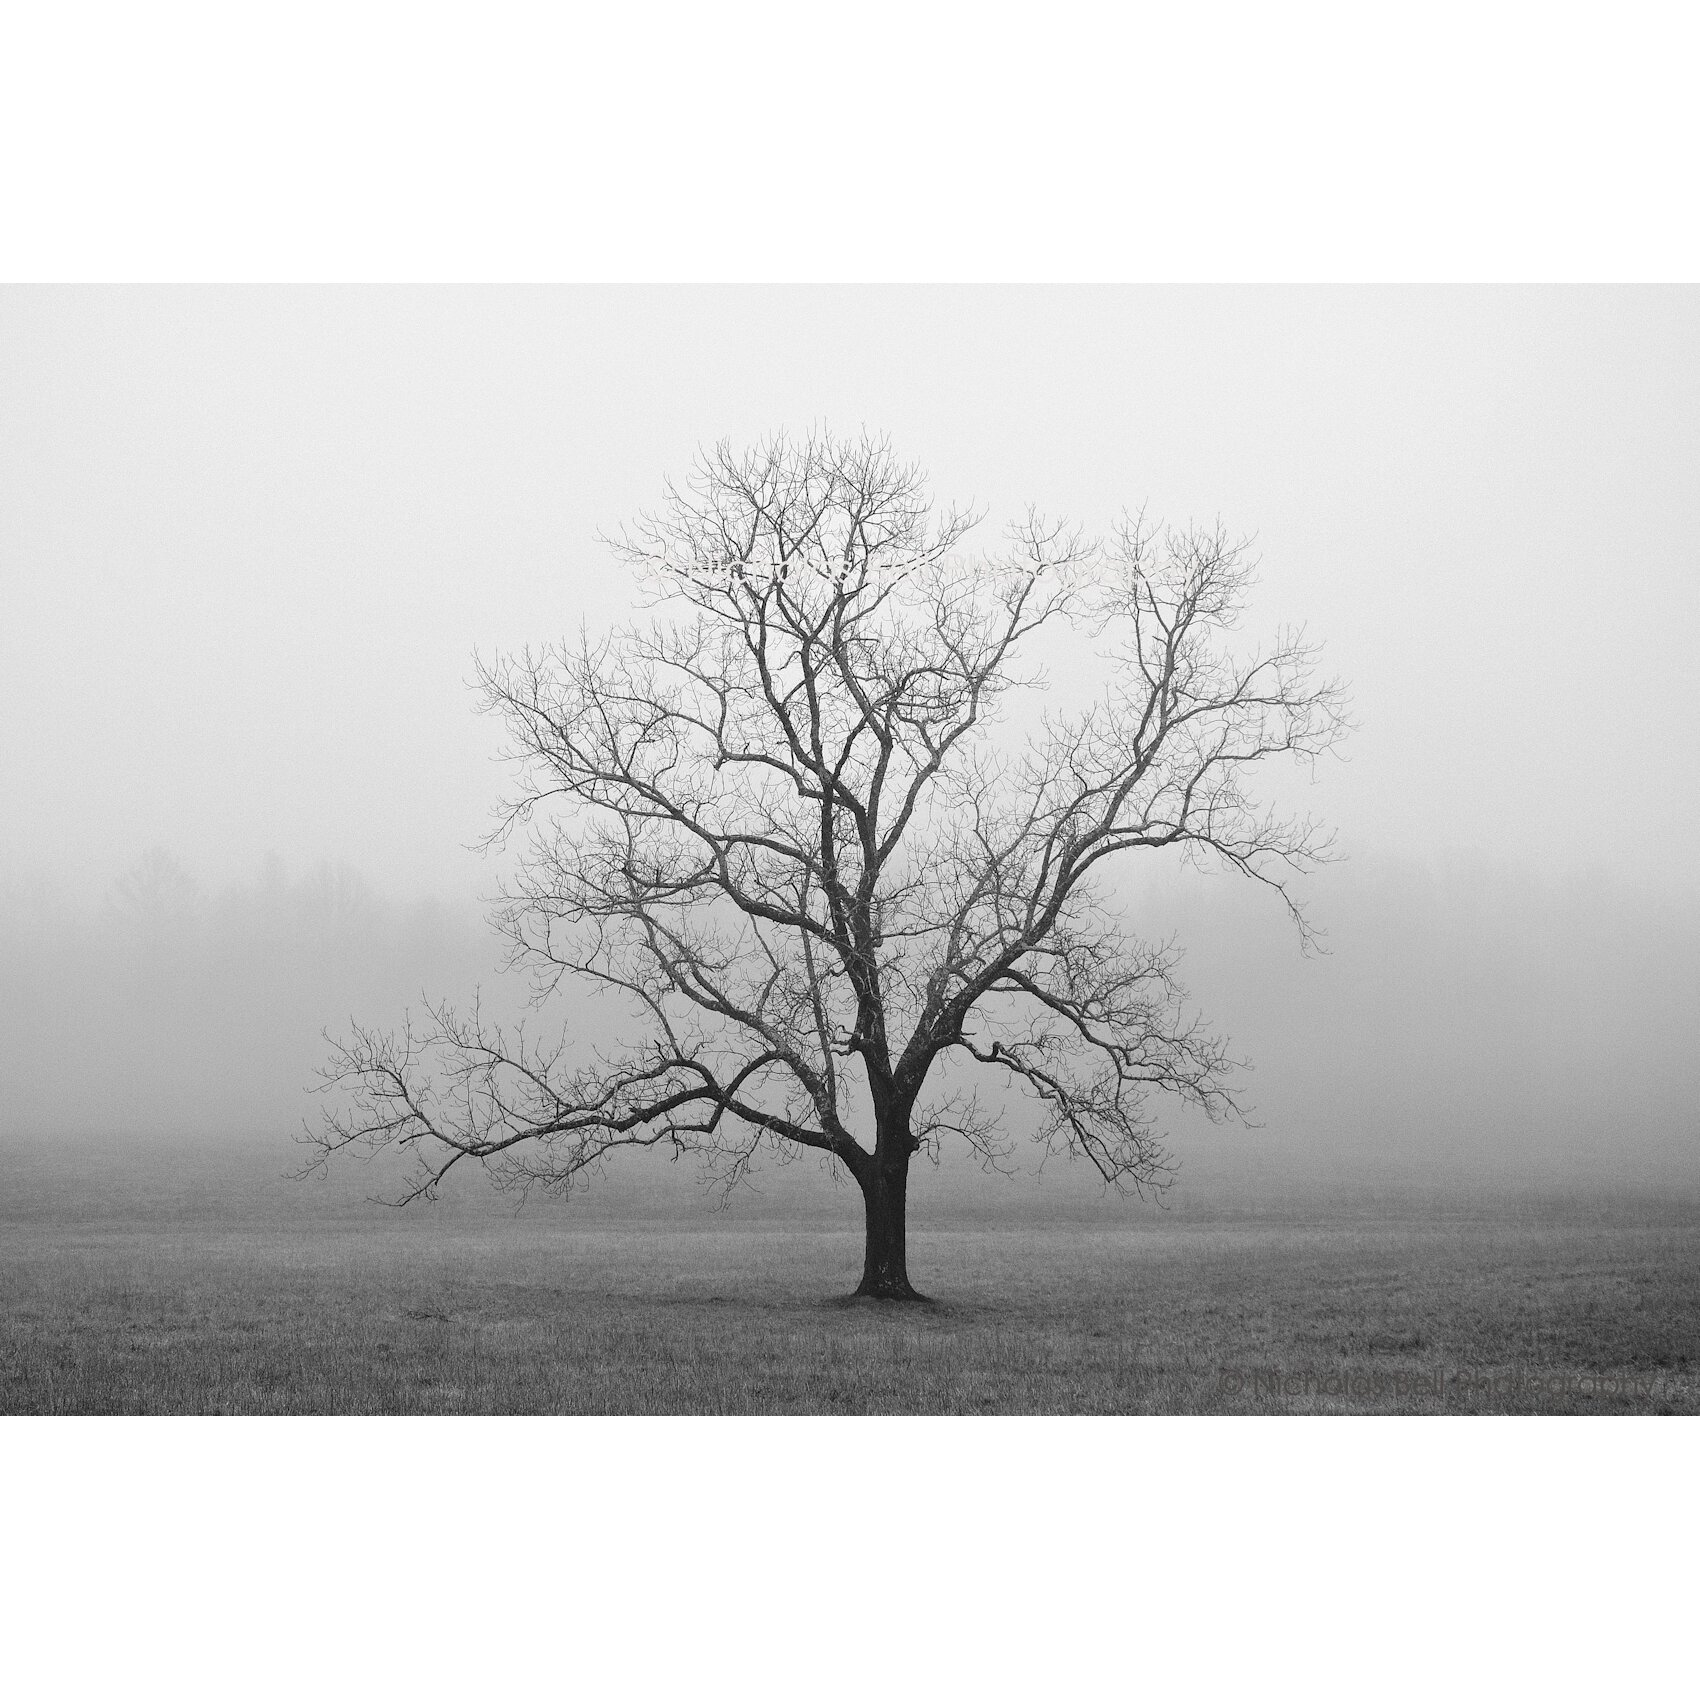 Zatista Limited Edition 'Velvet Sunrise' by Nicholas Bell Photographi...